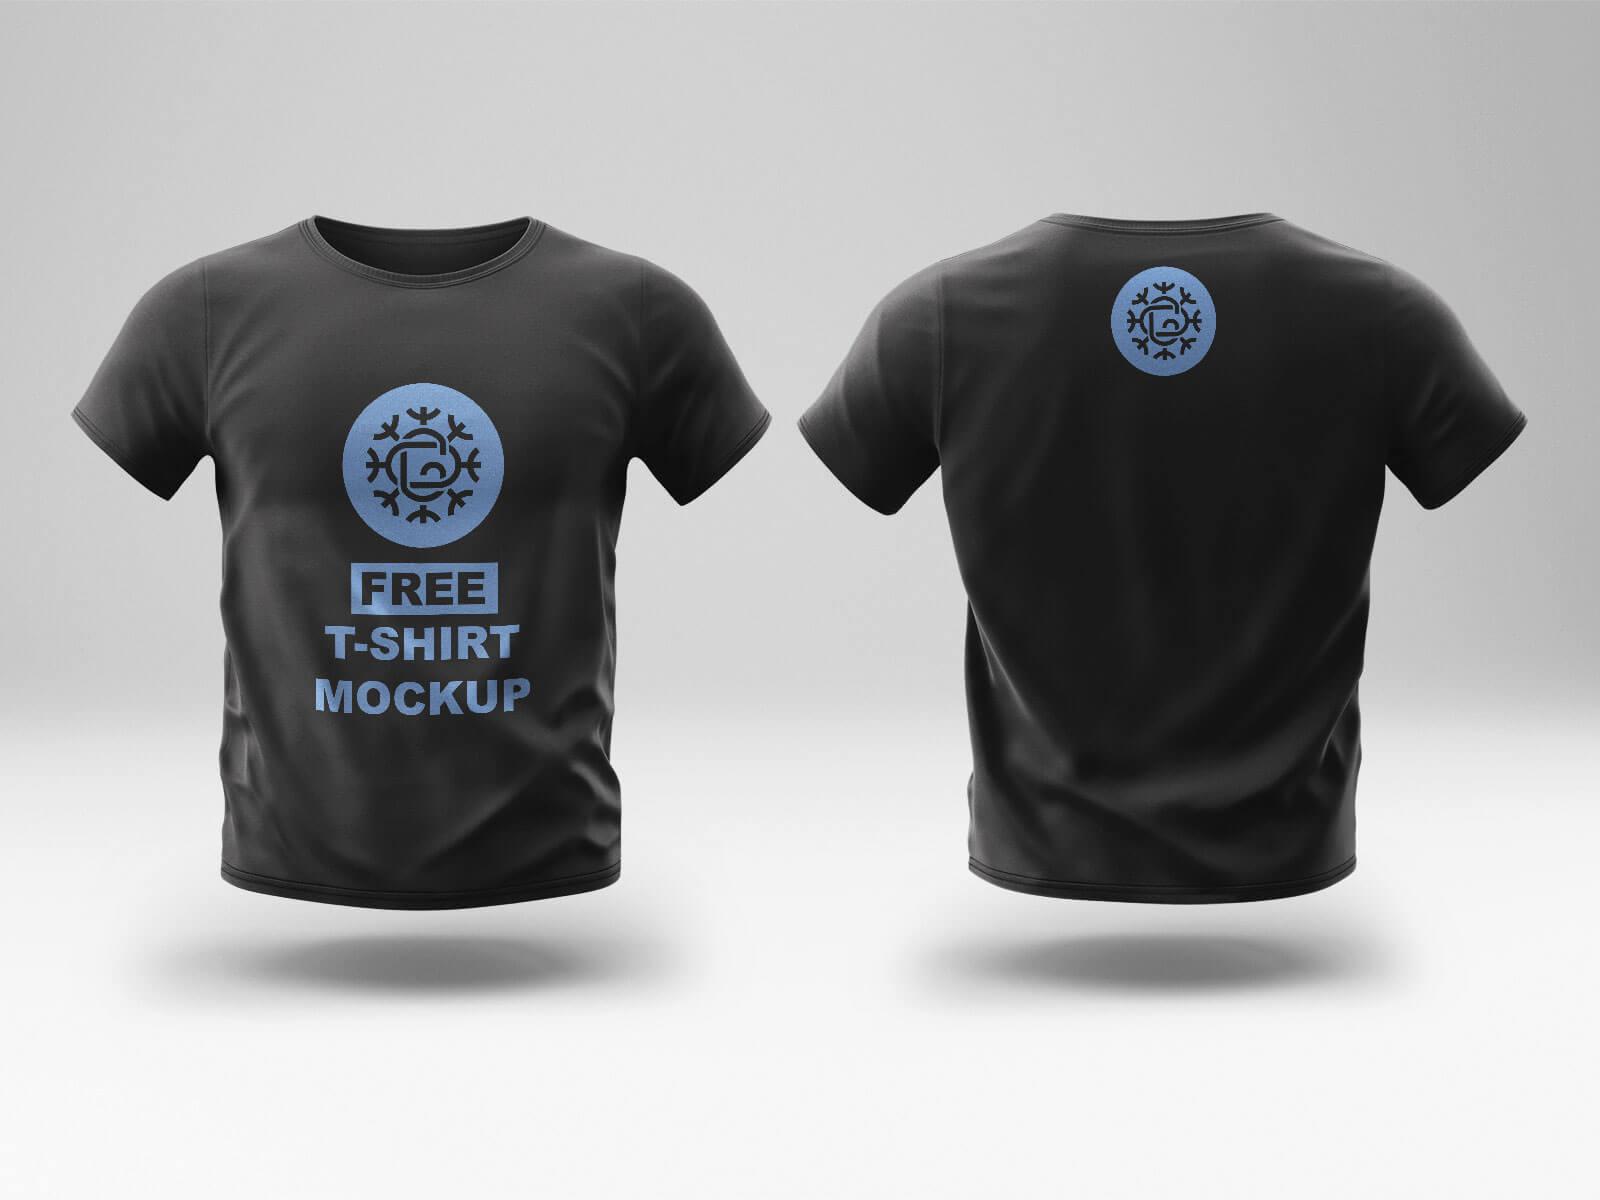 Free-Black-Front-&-Back-Tshirt-Mockup-PSD